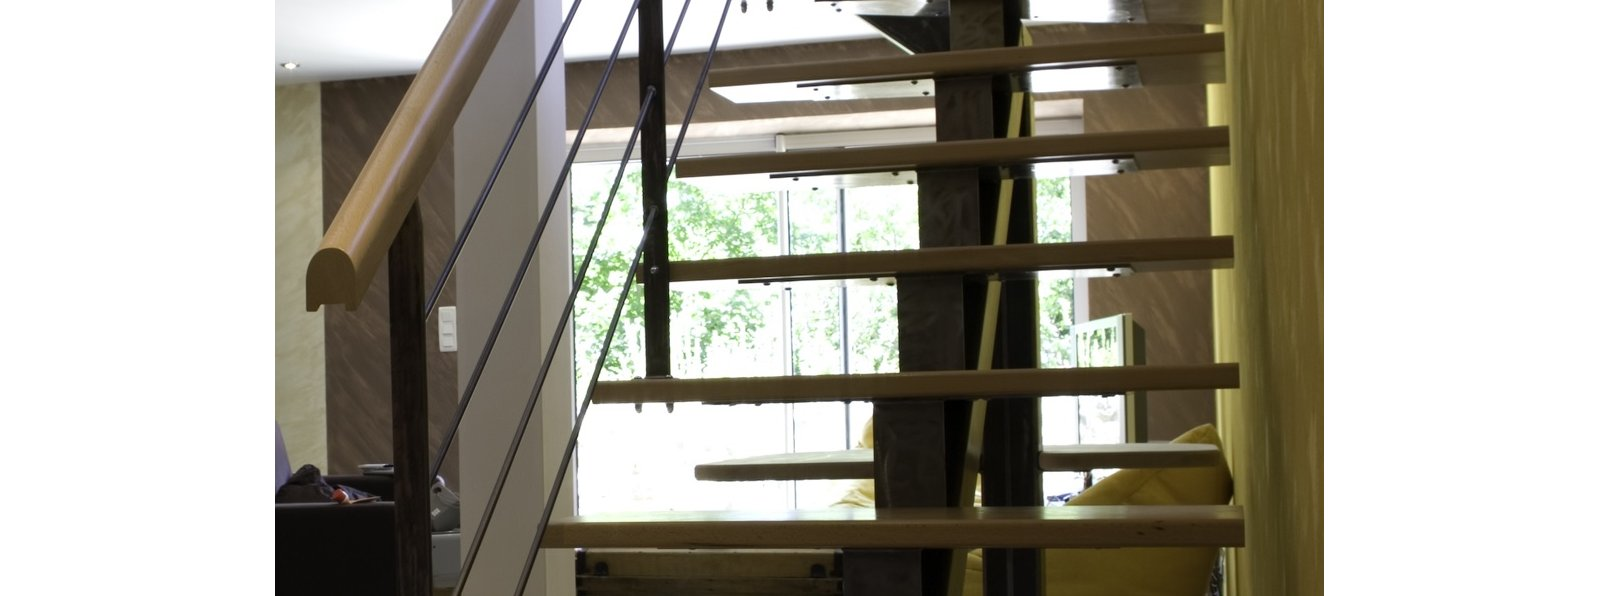 Sbm Escaliers Fabricant Escaliers Bois Metal Loire 42